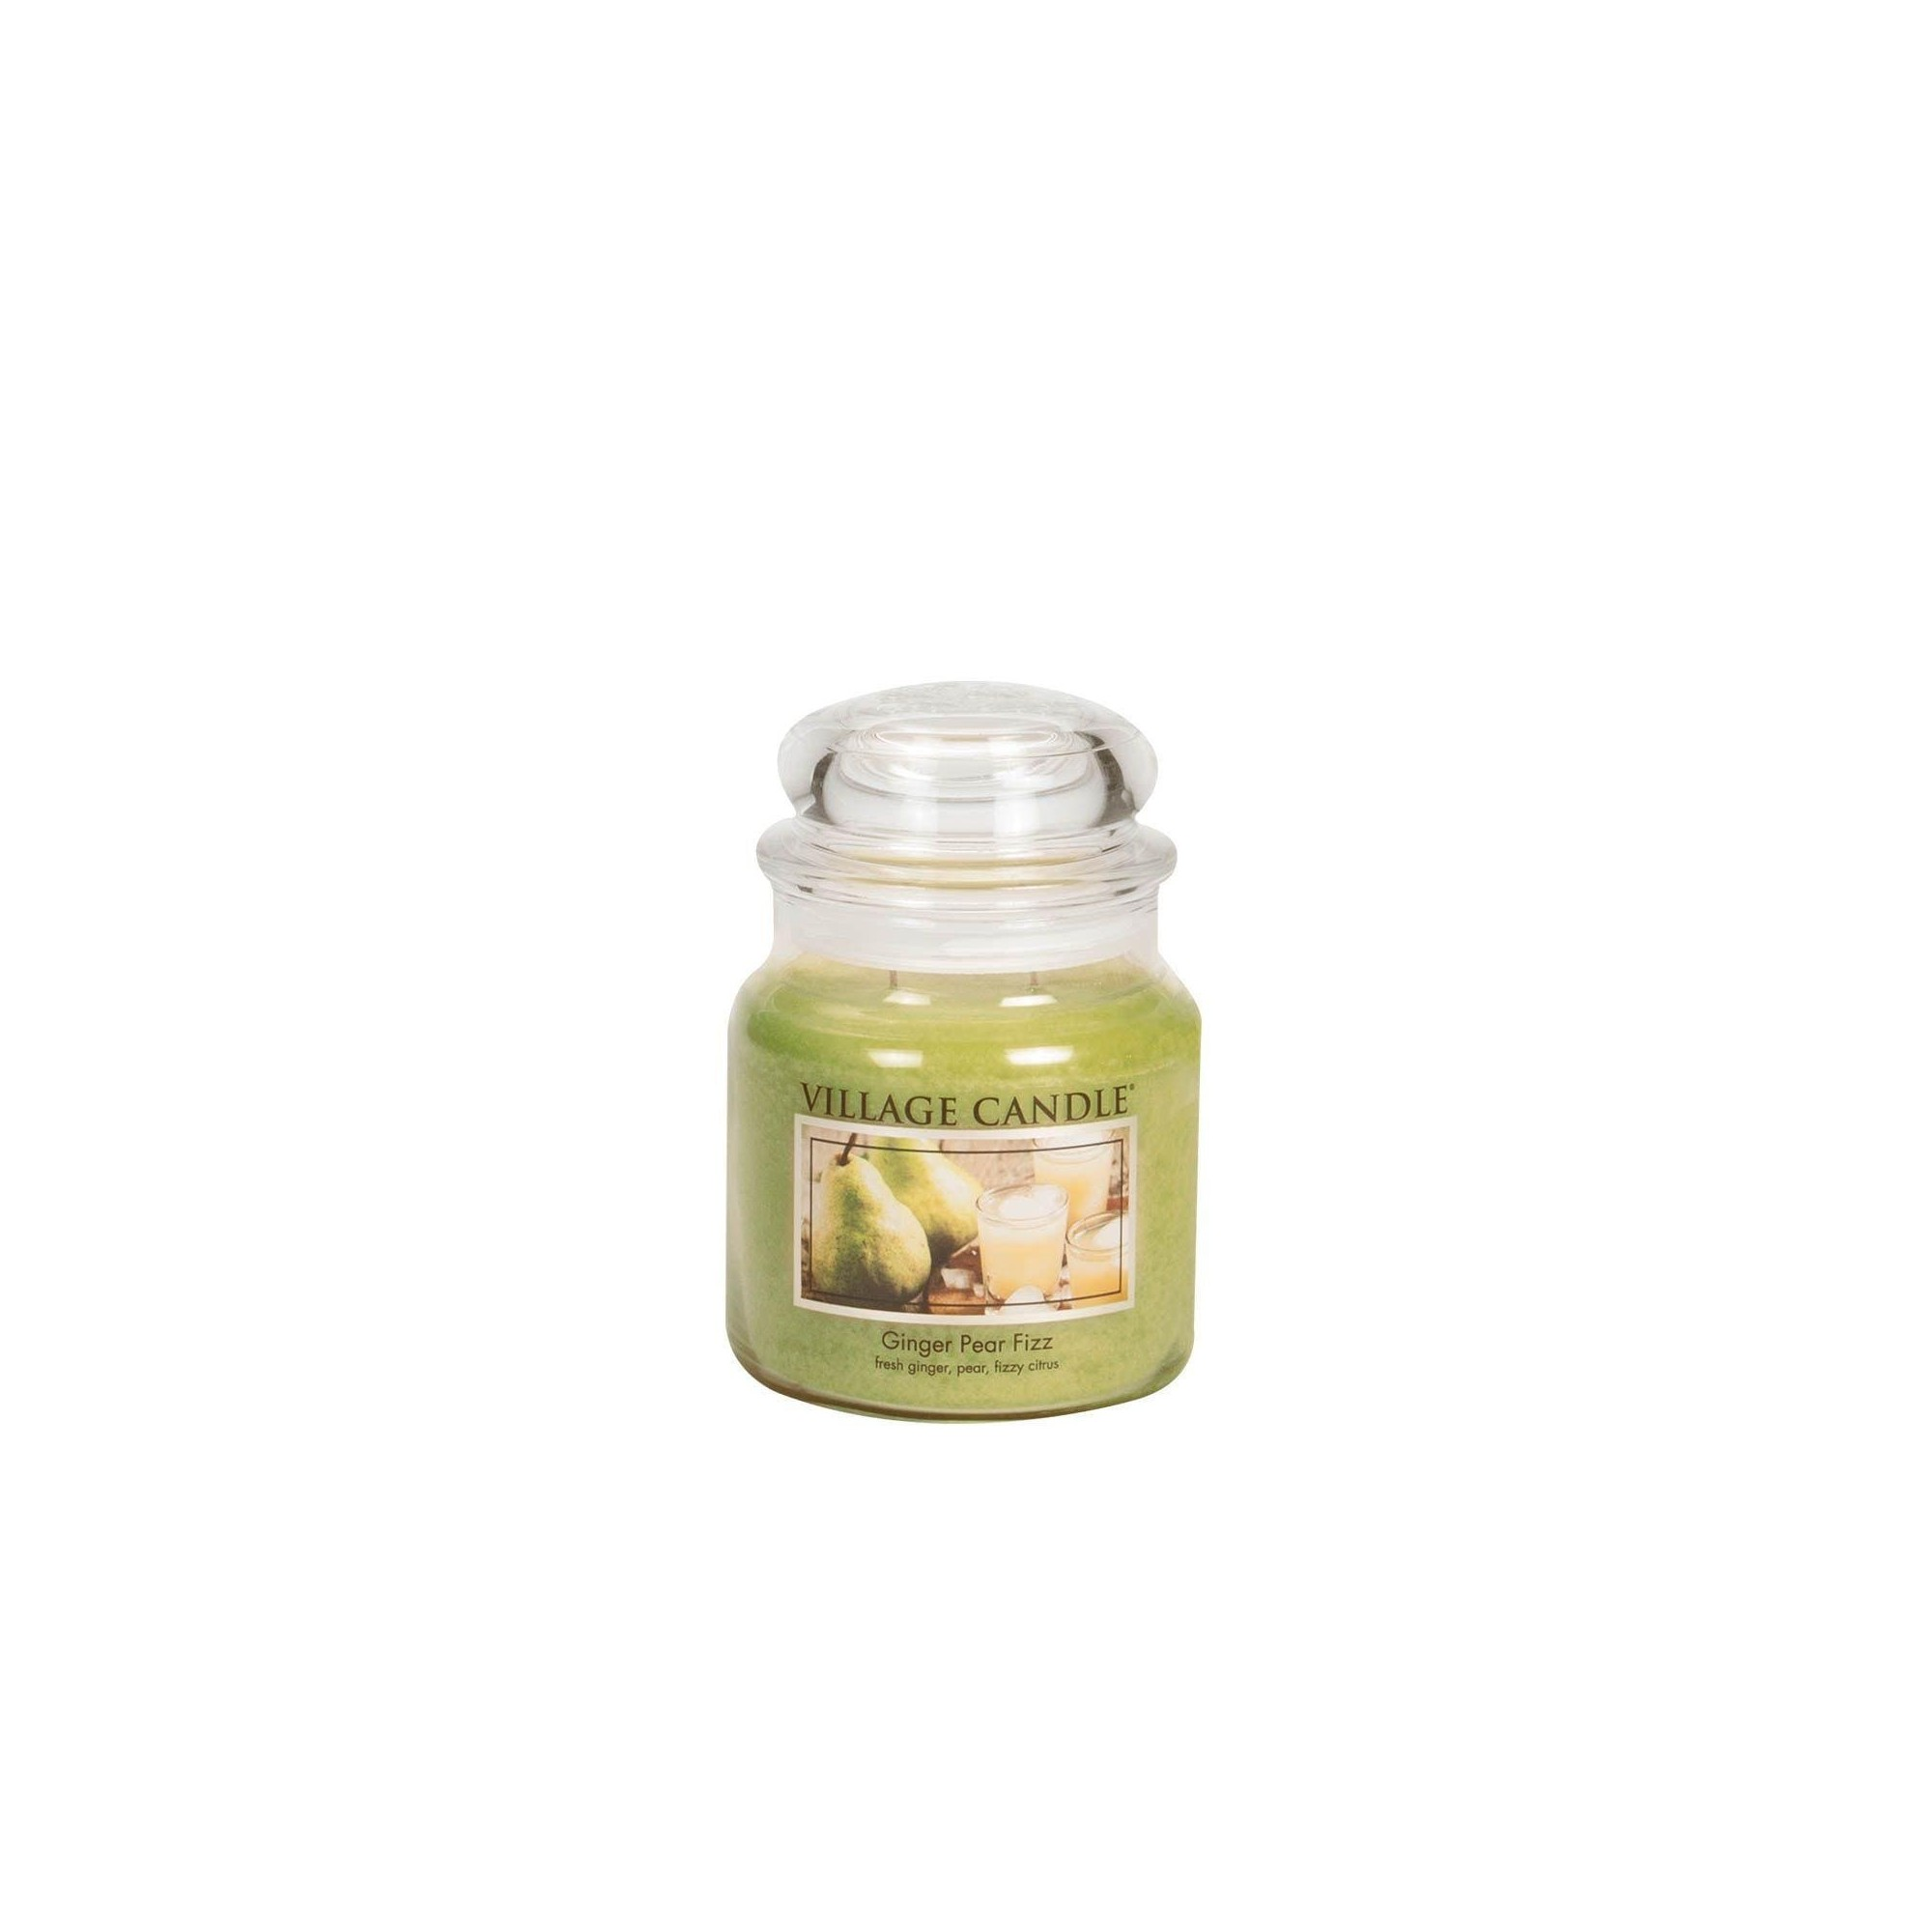 Village Candle Ginger Pear Fizz Medium Jar Glass